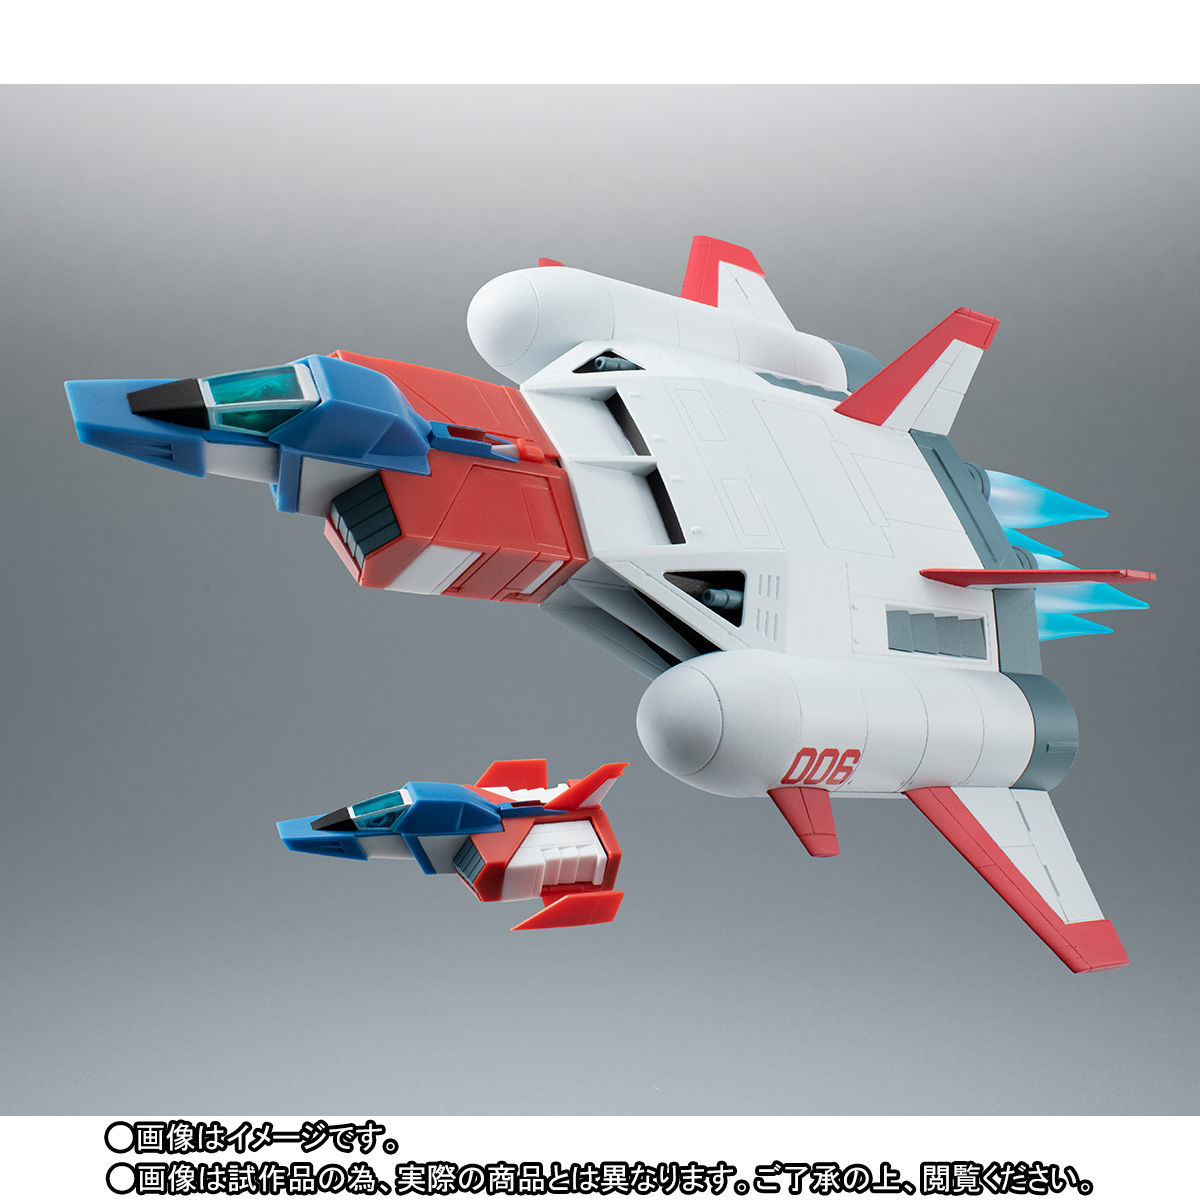 ROBOT魂〈SIDE MS〉『FF-X7-Bst コア・ブースター 2機セット ver. A.N.I.M.E. ~スレッガー005 & セイラ006~』機動戦士ガンダム 可動フィギュア-002